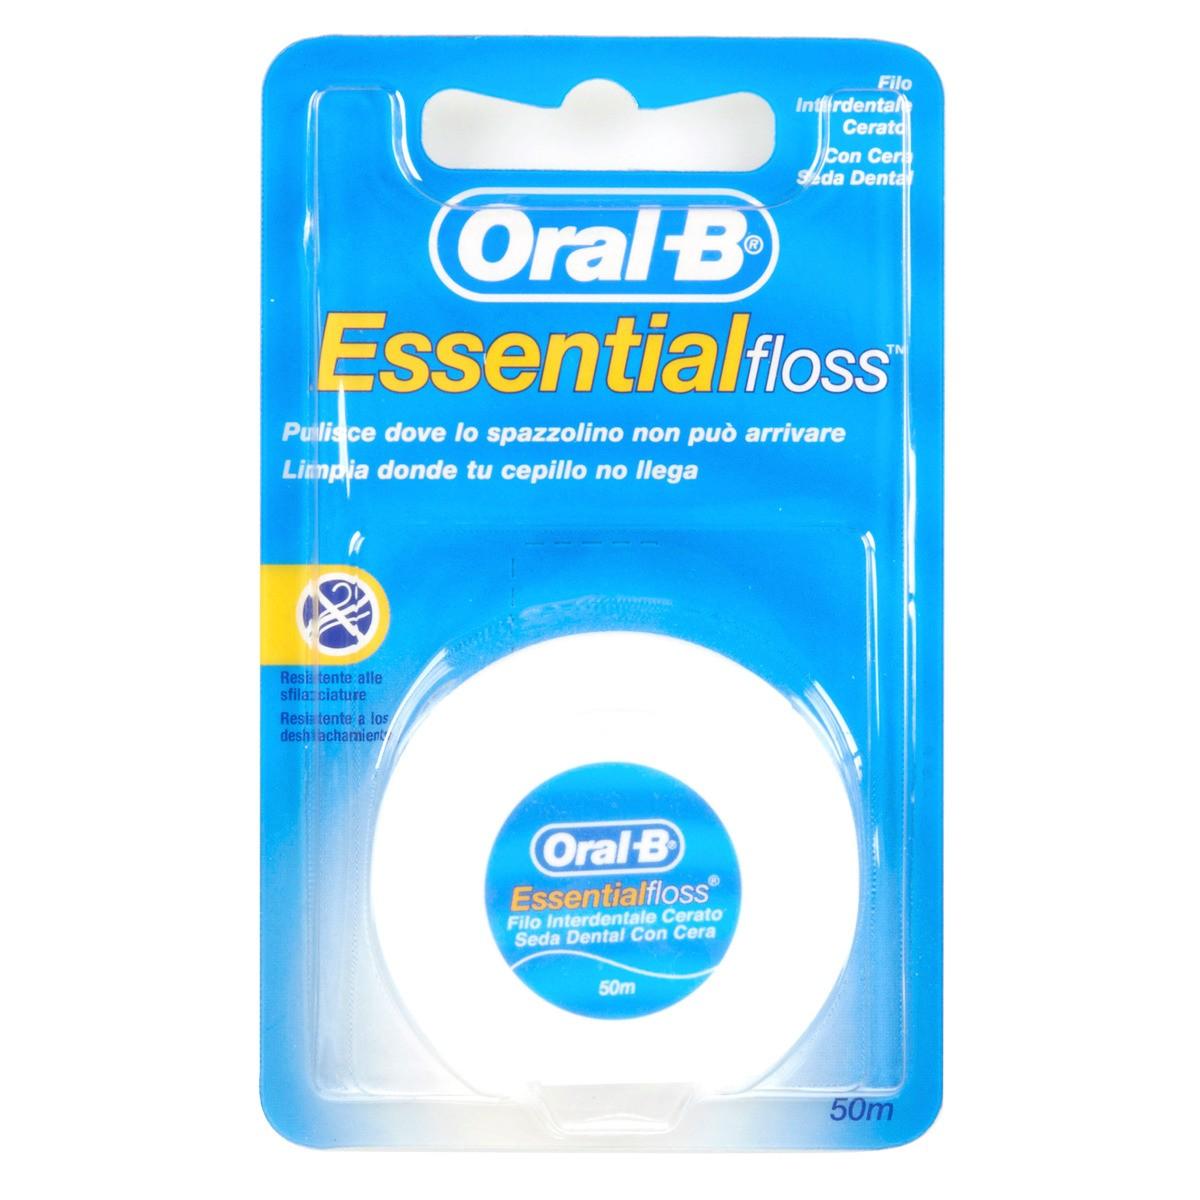 Oral-B Filo interdentale Essential Floss